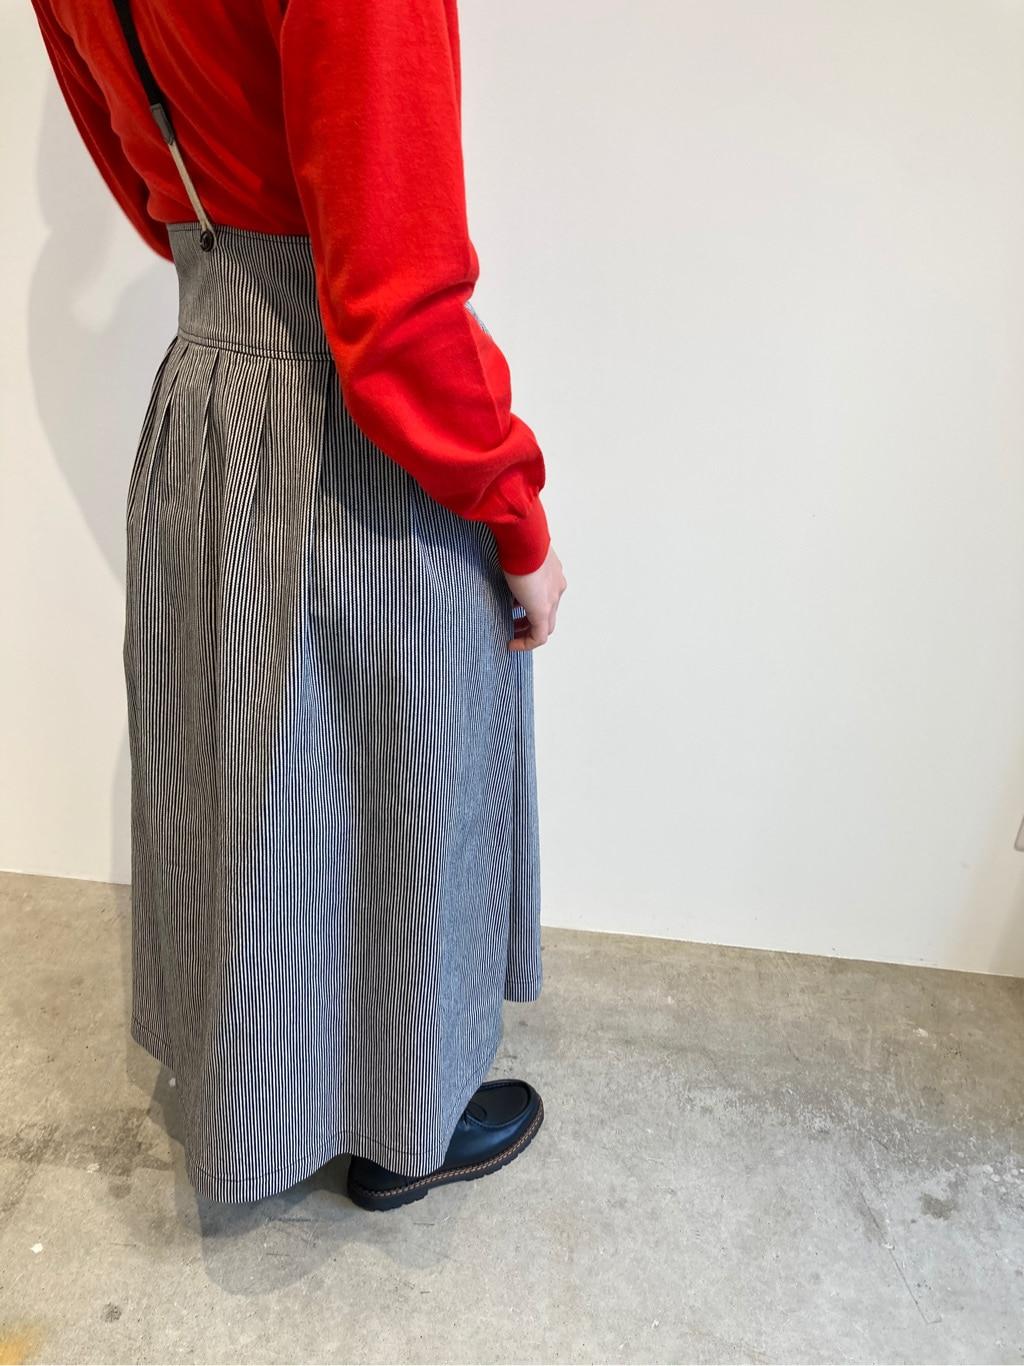 - bulle de savon FLAT AMB 名古屋栄路面 身長:162cm 2020.12.05